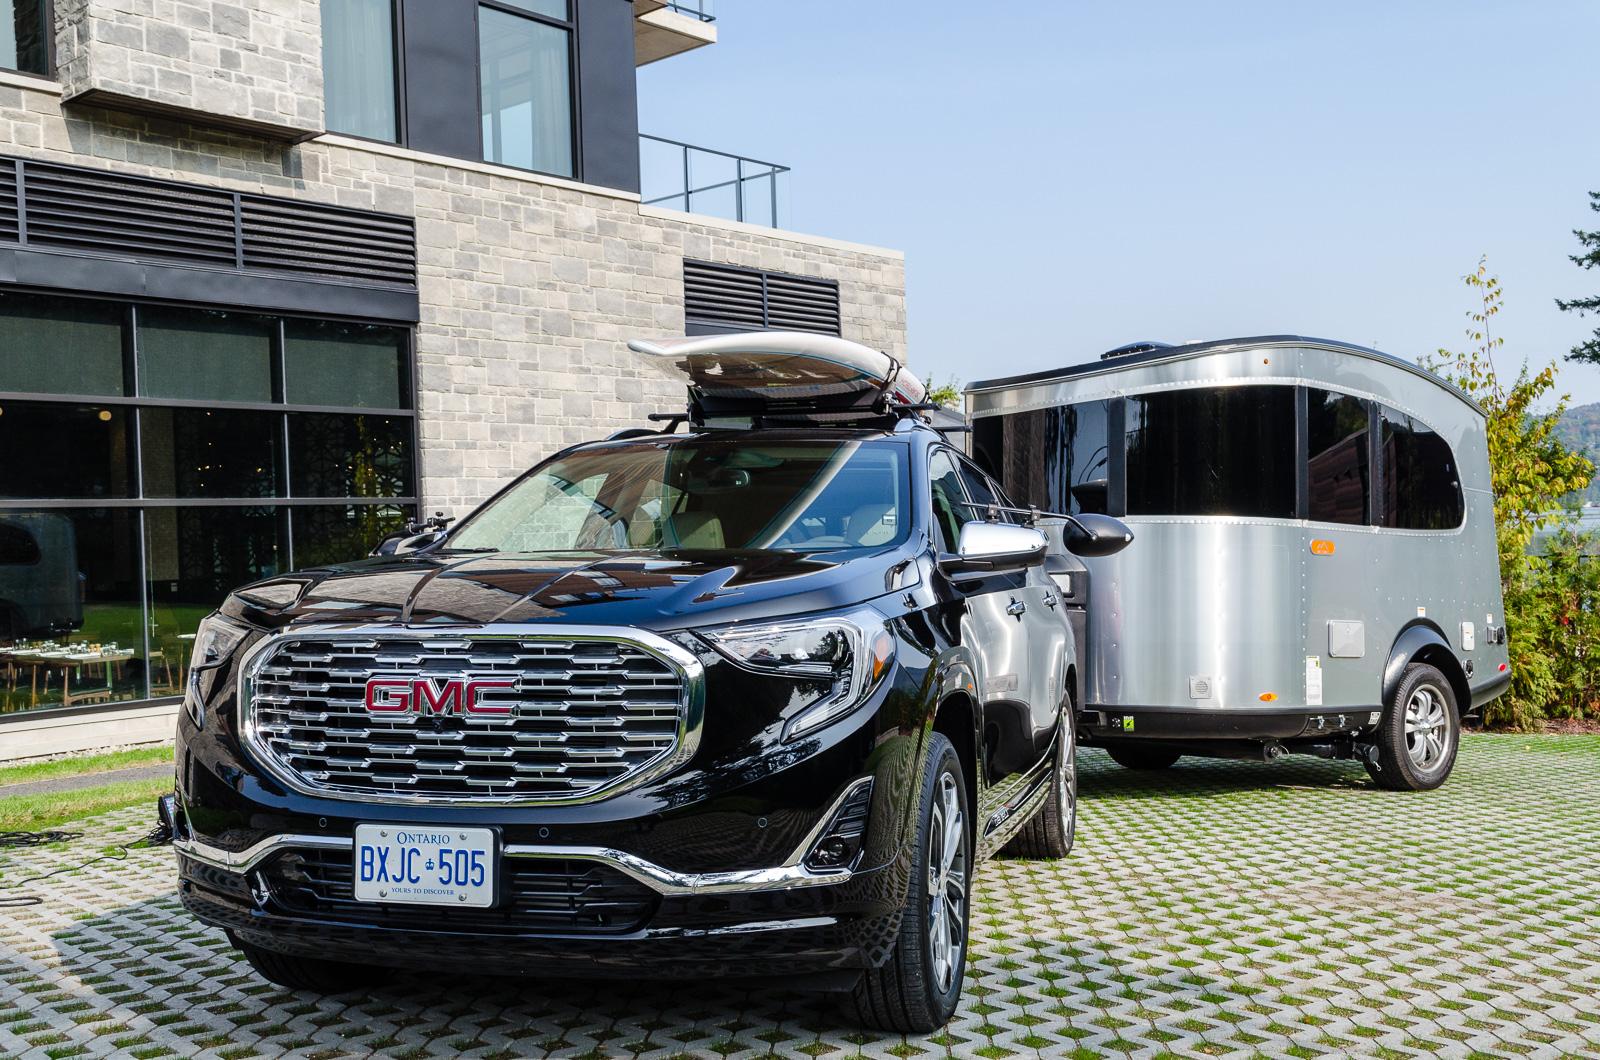 2018 gmc terrain test drive in lac beauport quebec. Black Bedroom Furniture Sets. Home Design Ideas